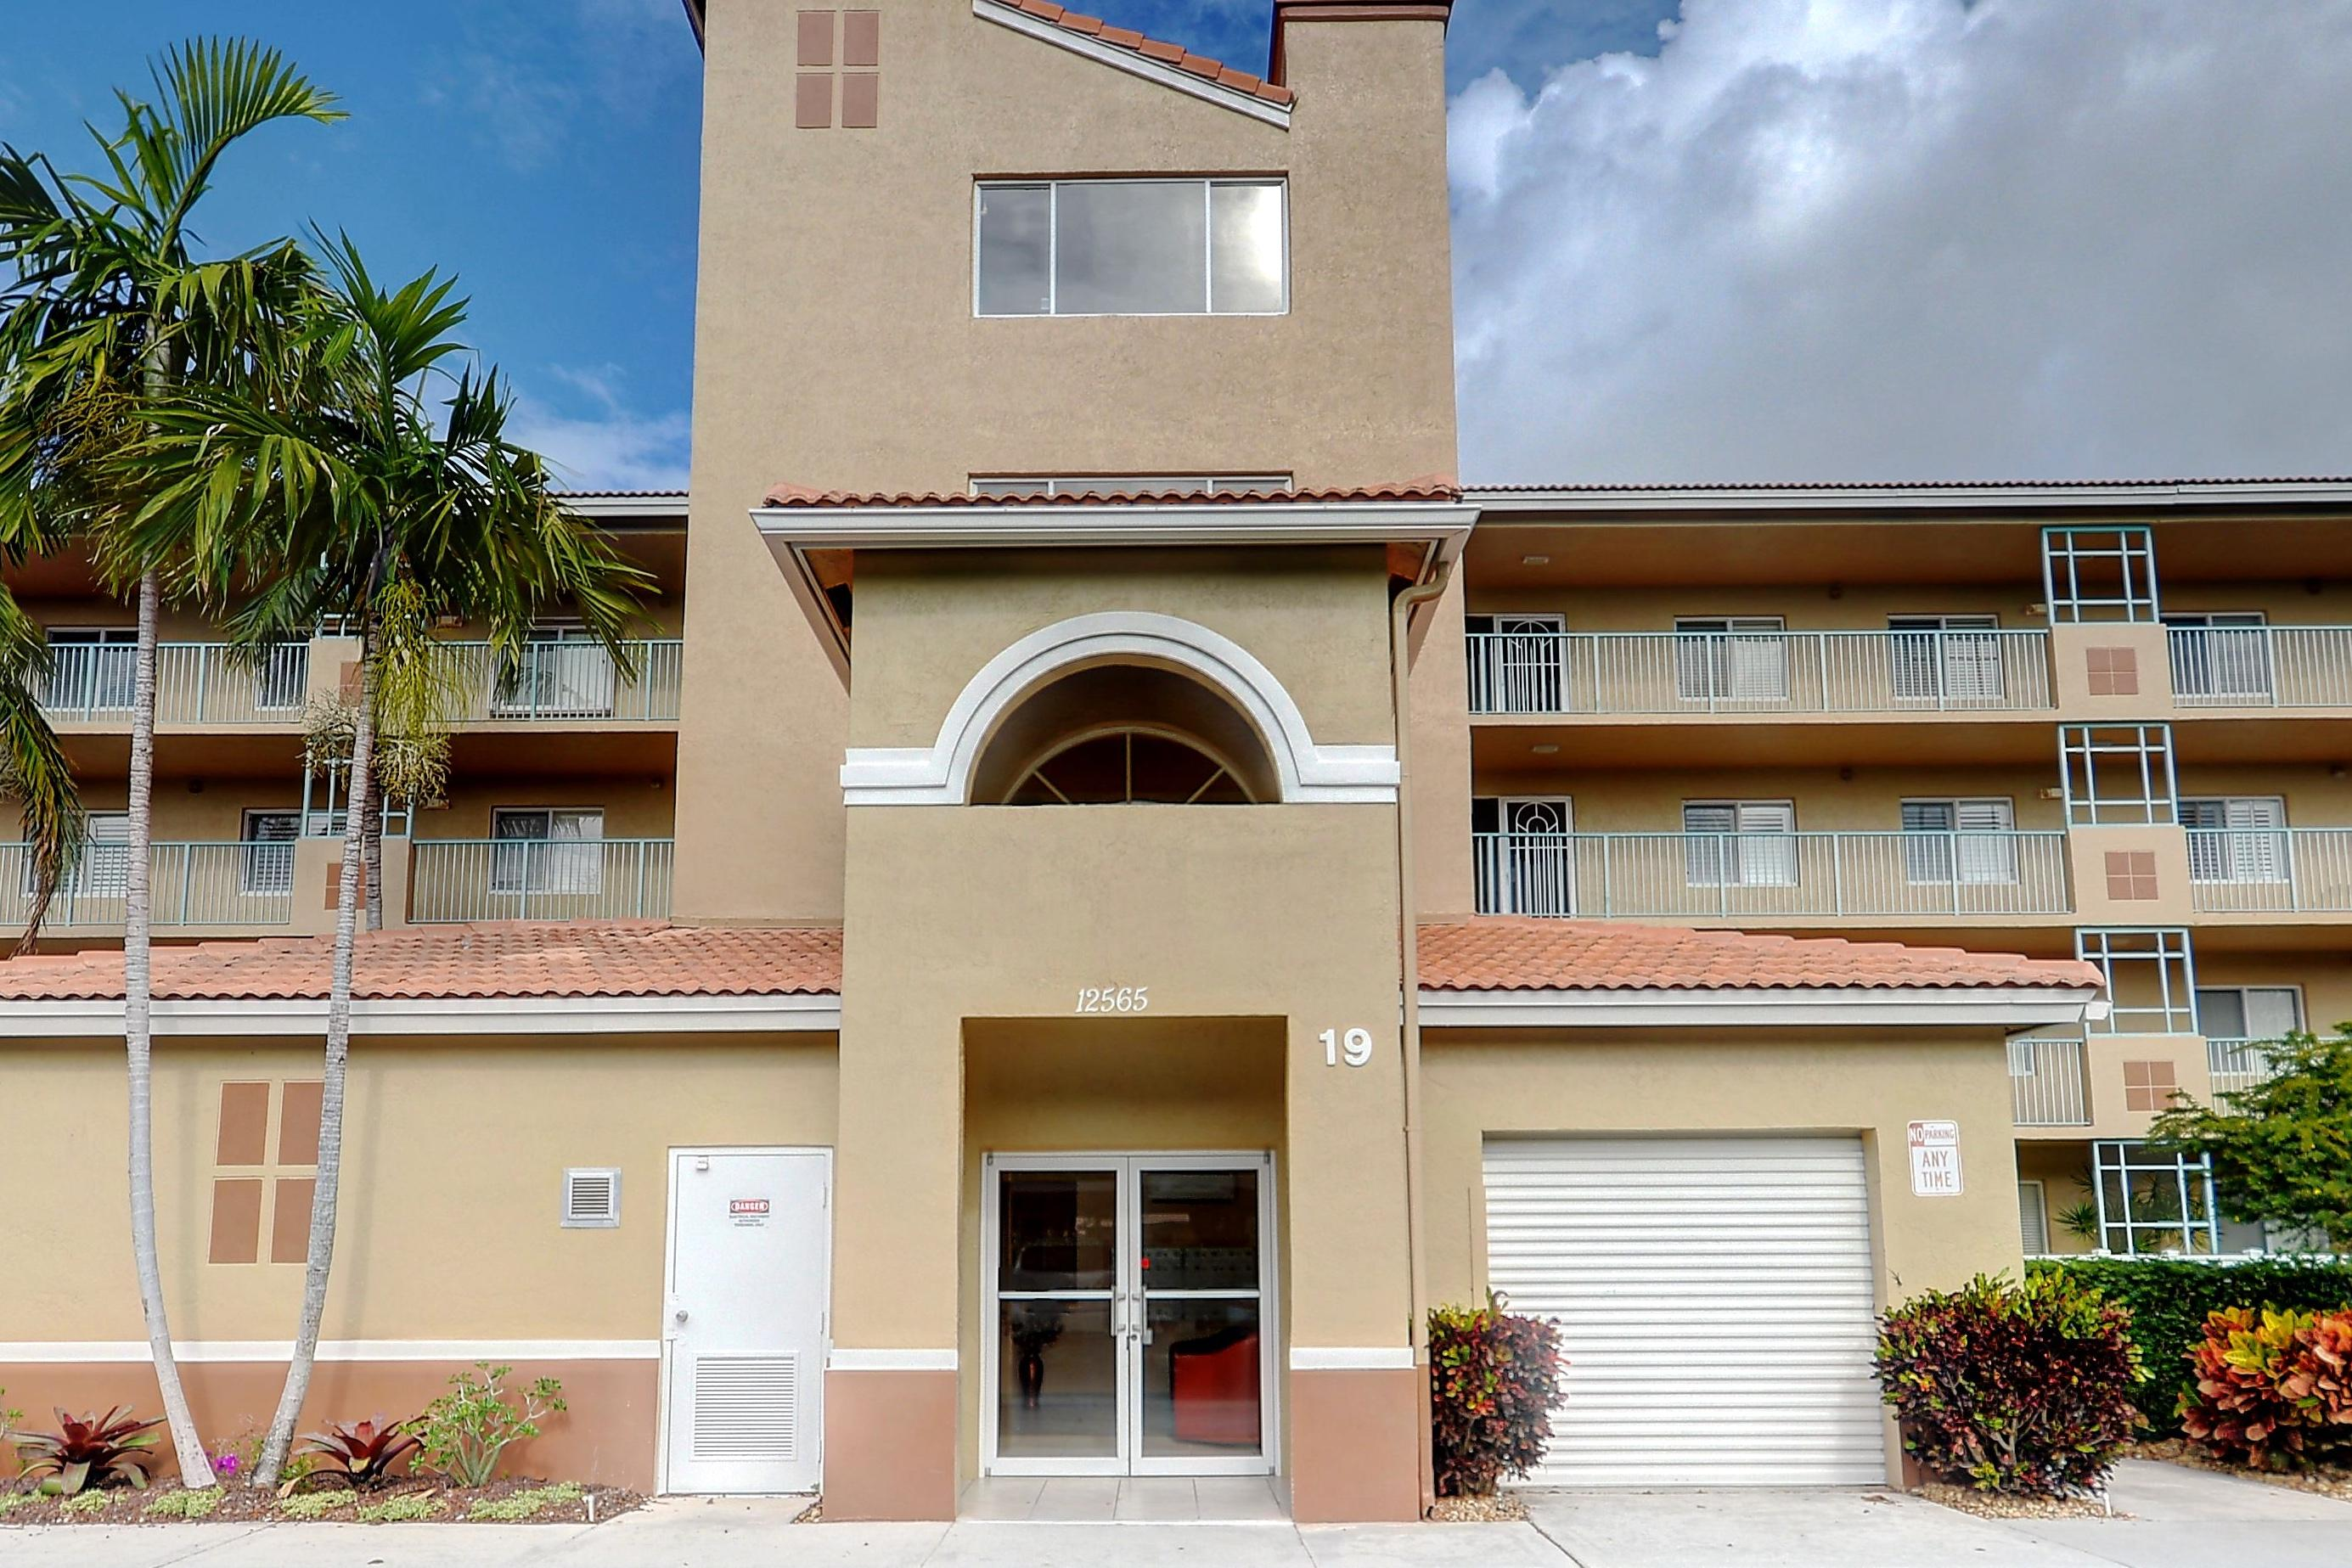 12565 Imperial Isle Drive 303 Boynton Beach, FL 33437